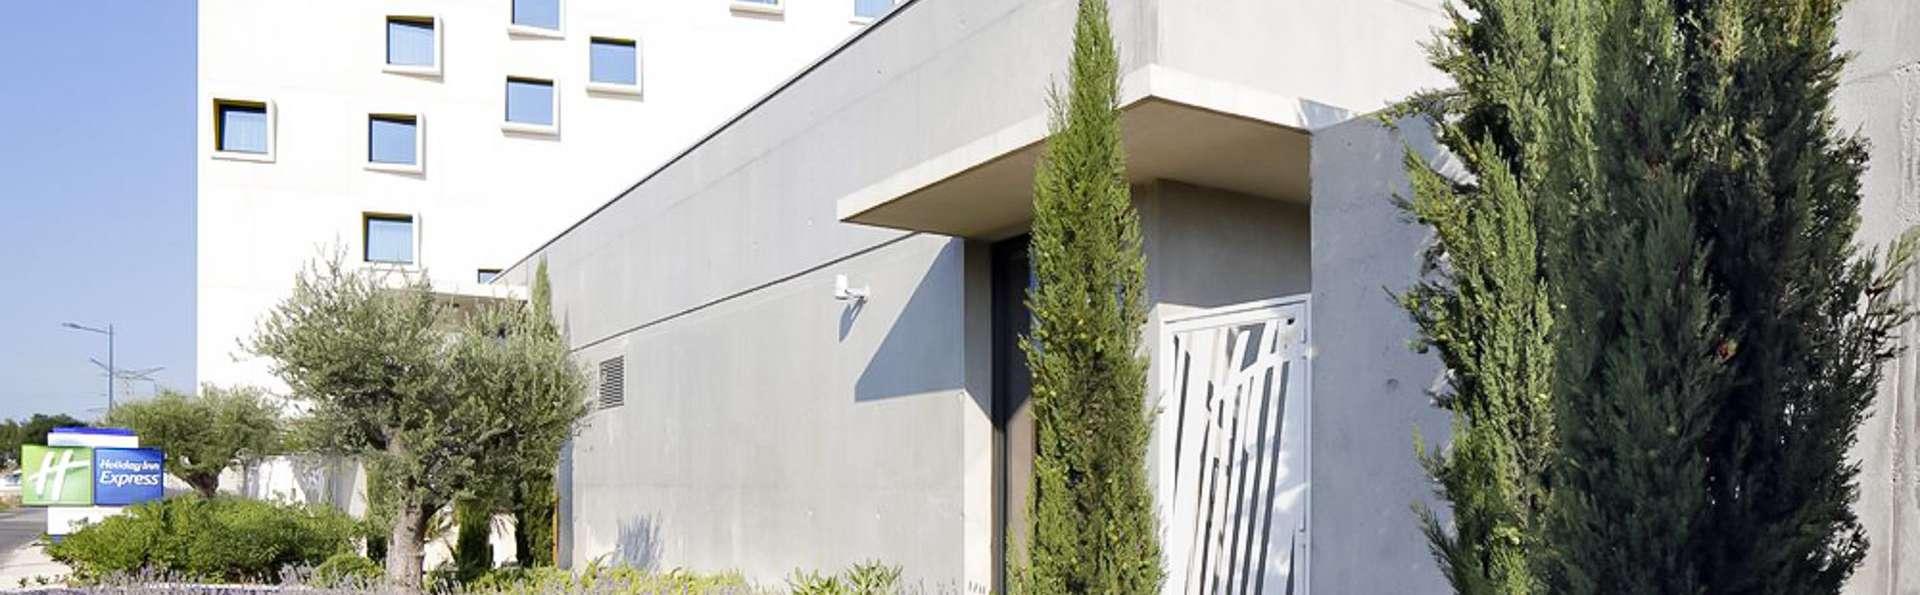 Holiday Inn Express Montpellier Odysseum  - EDIT_FRONT_03.jpg